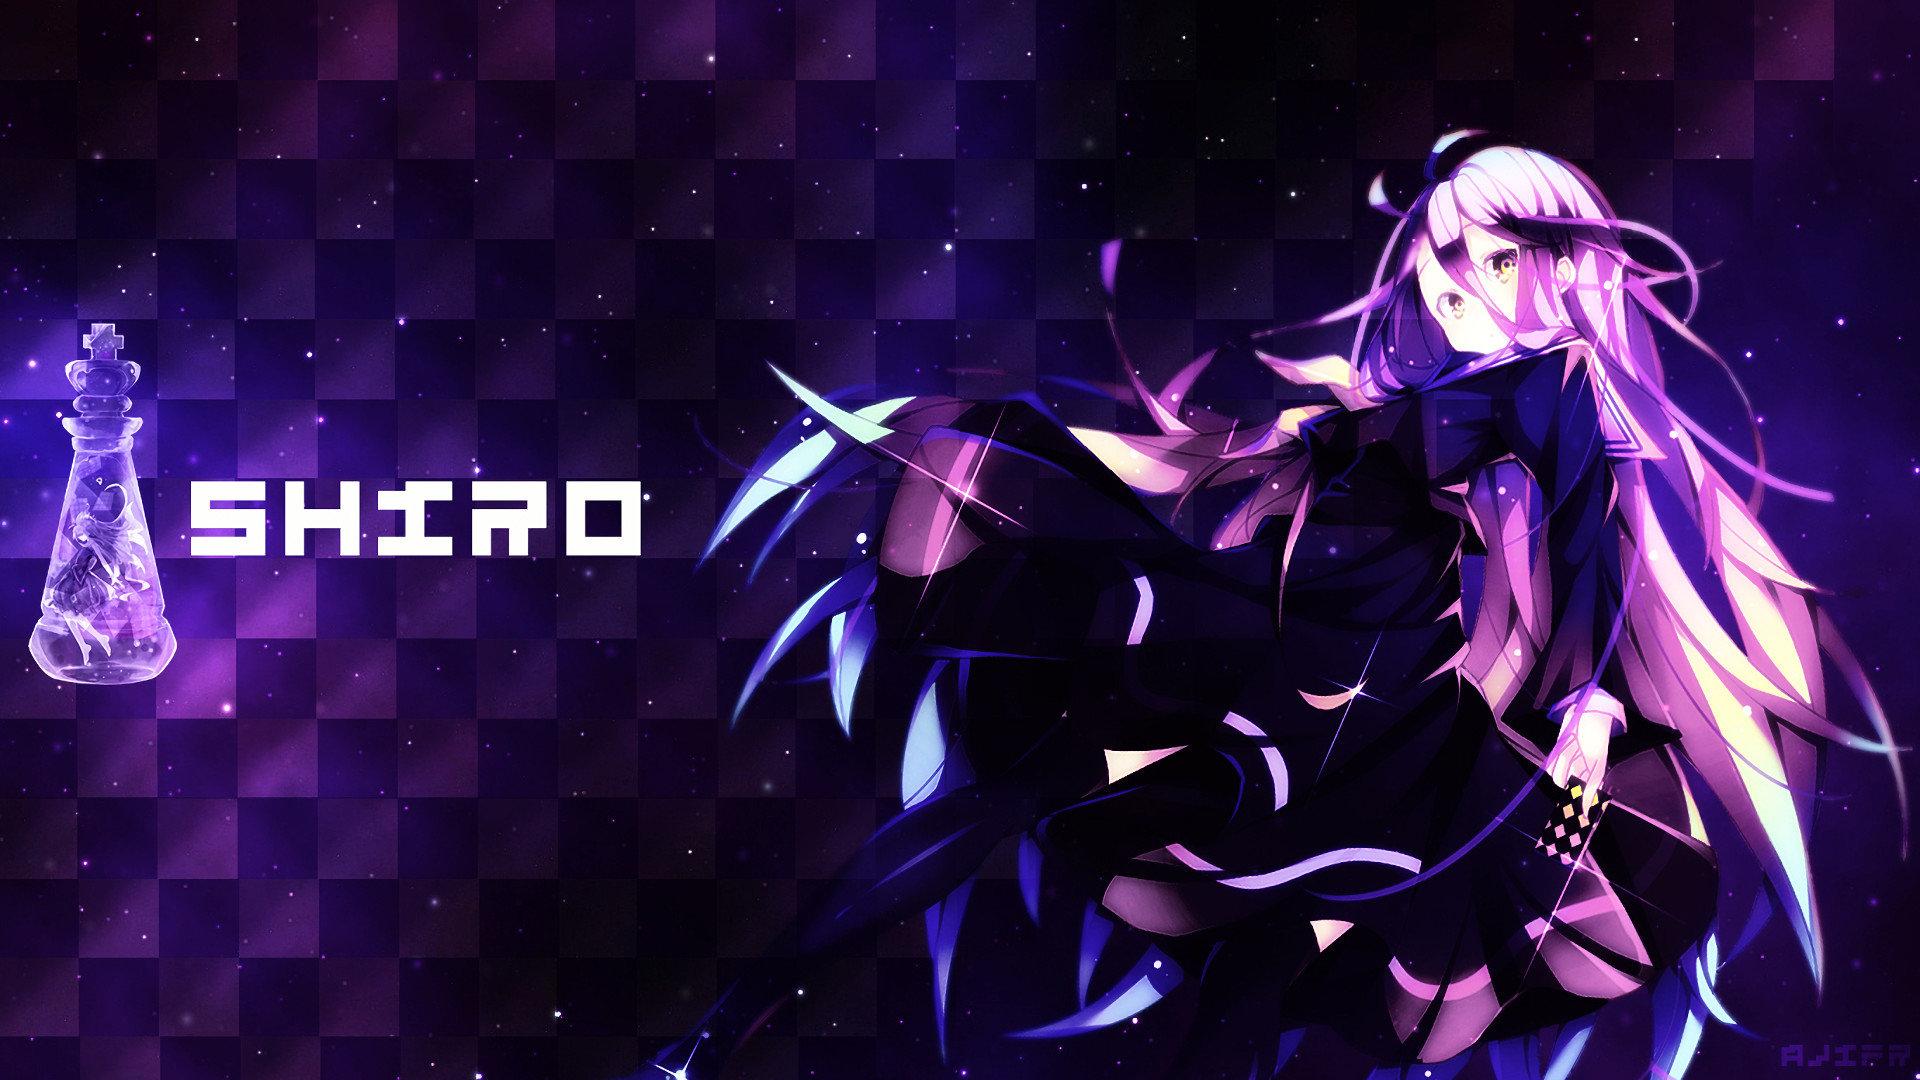 Download Hd 1080p Shiro Desktop Wallpaper Id No Game No Life